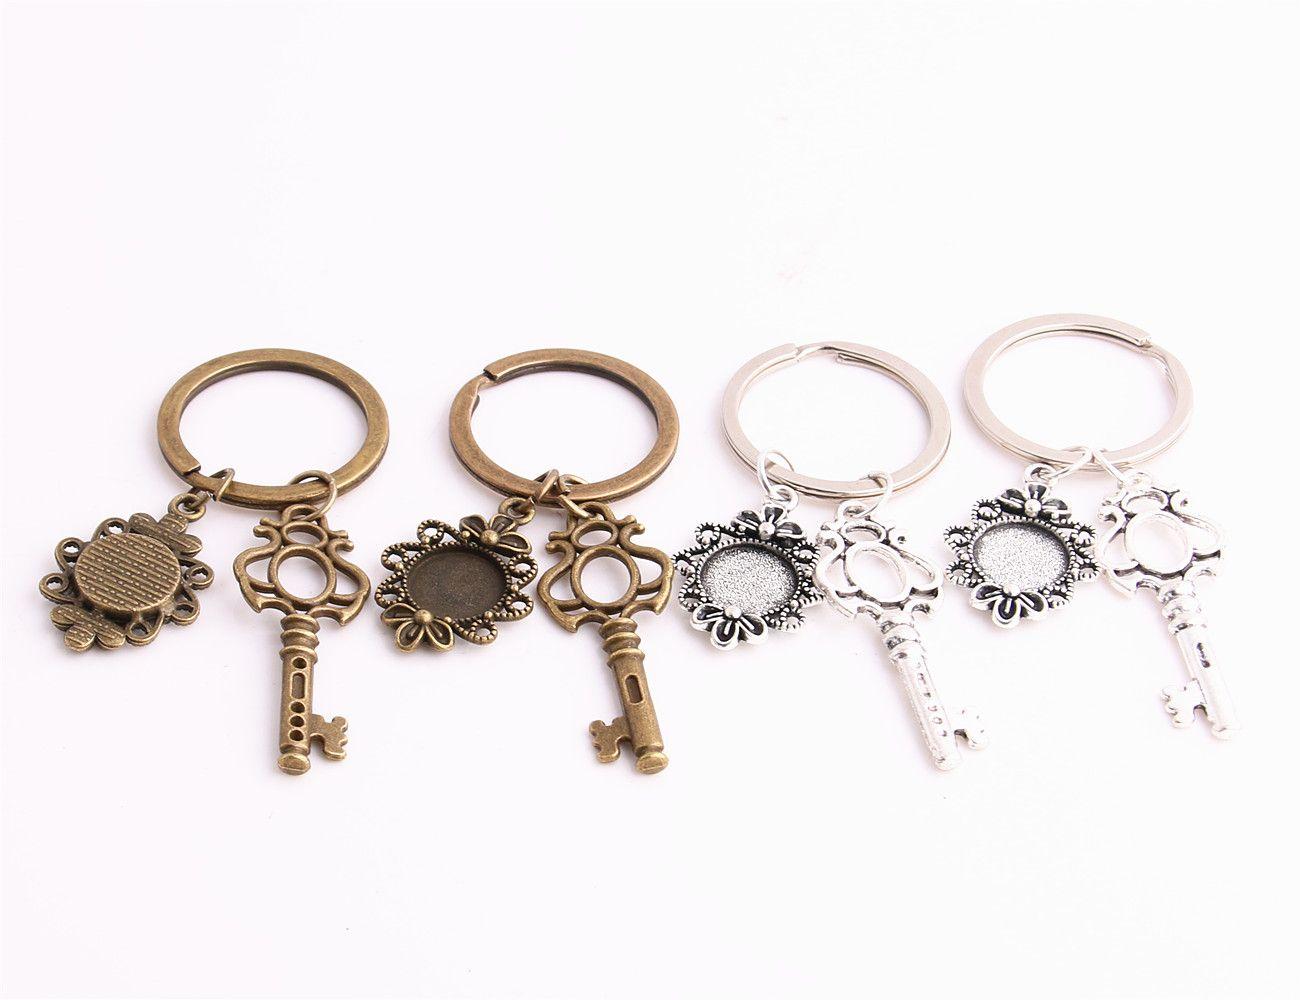 SWEET BELL 3pcs/lot Metal Alloy Zinc Key Chain Fit Round 12.5mm Cabochon Base Key Charm Pendant Jewelry Making C0898